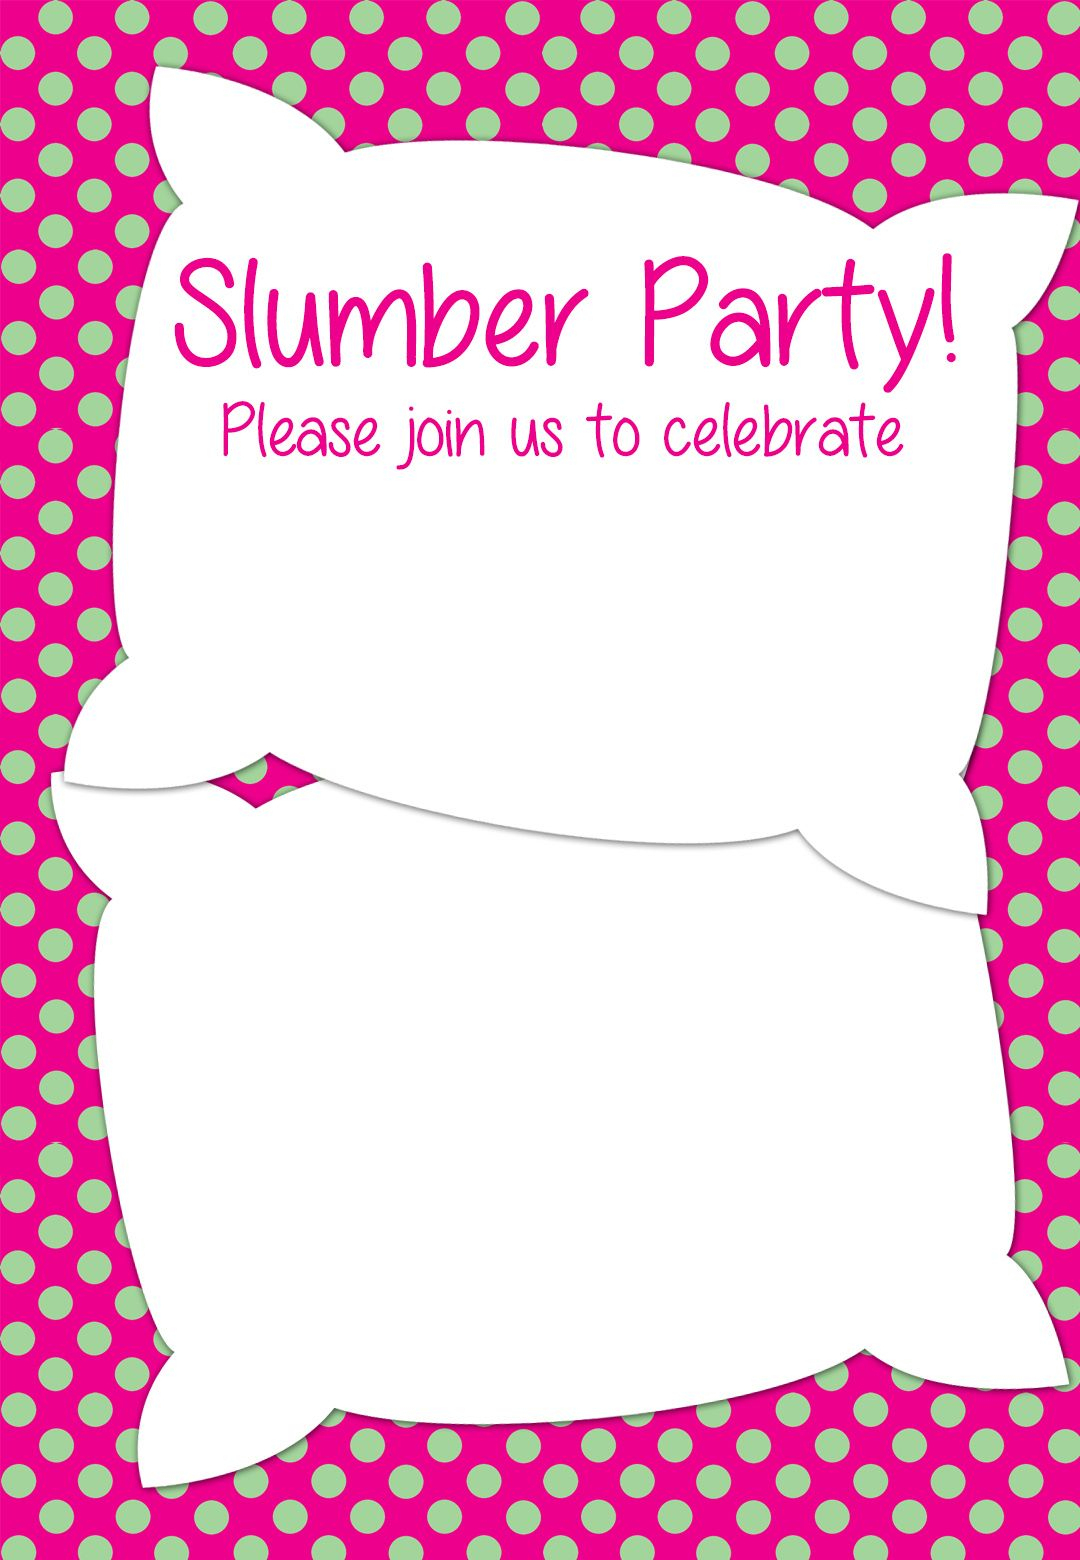 Free Printable Slumber Party Invitation | Party Ideas In 2019 - Free Printable Invitations Templates